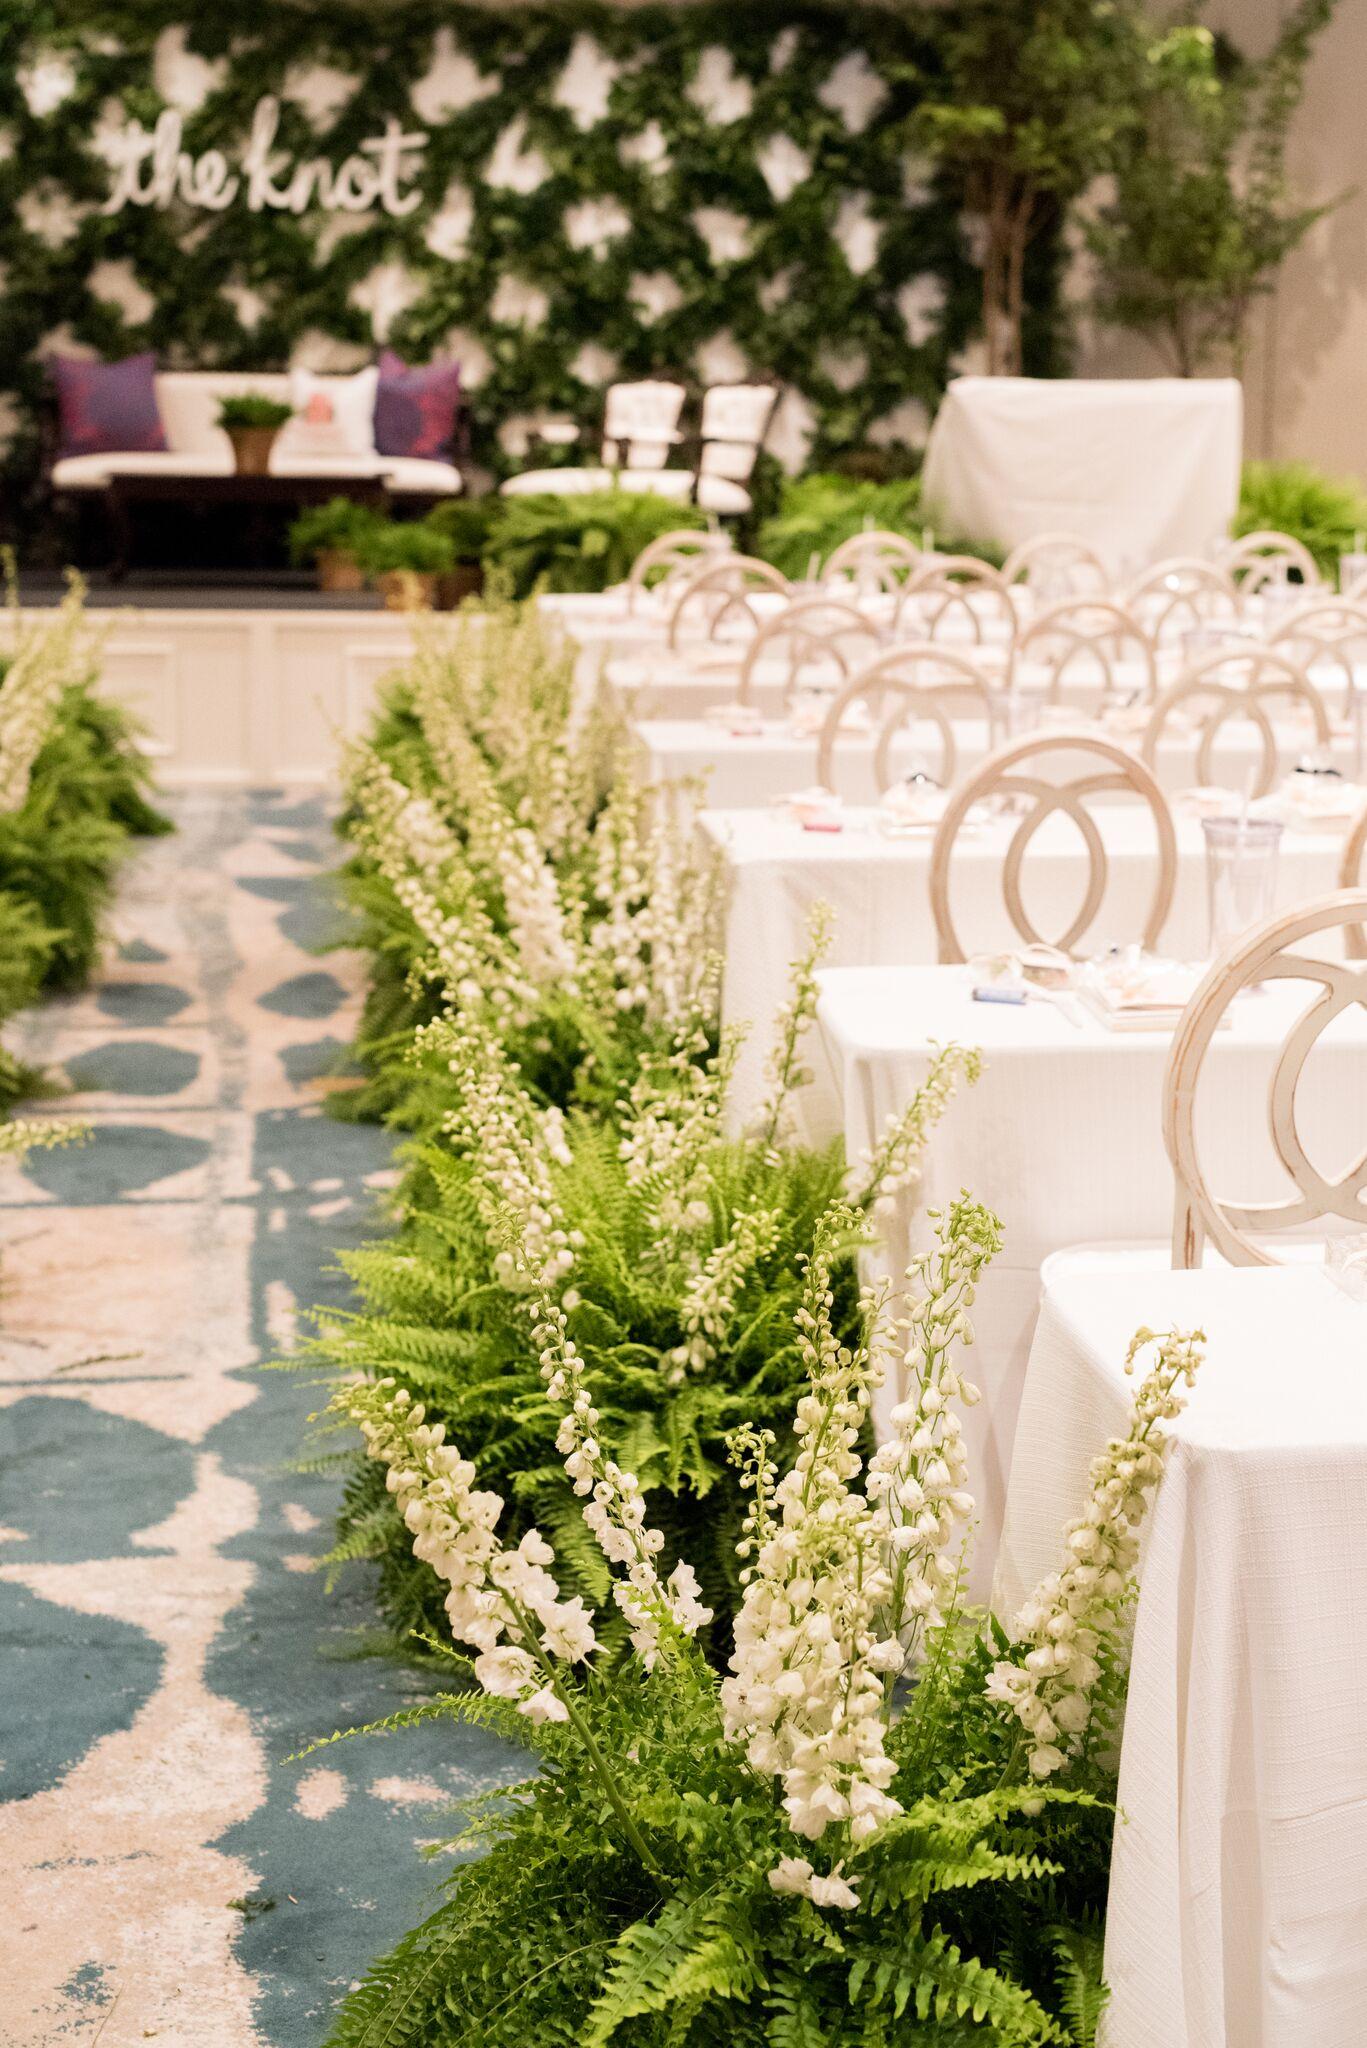 the-knot-savannah-ivory-and-beau-bridal-boutique-savannah-wedding-dress-savannah-bridal-boutique-savannah-bridal-shop-savannah-wedding-gowns-savannah-wedding-planner-savannah-wedding-coordinator-savannah-bridesmaids-dresses-3.jpeg